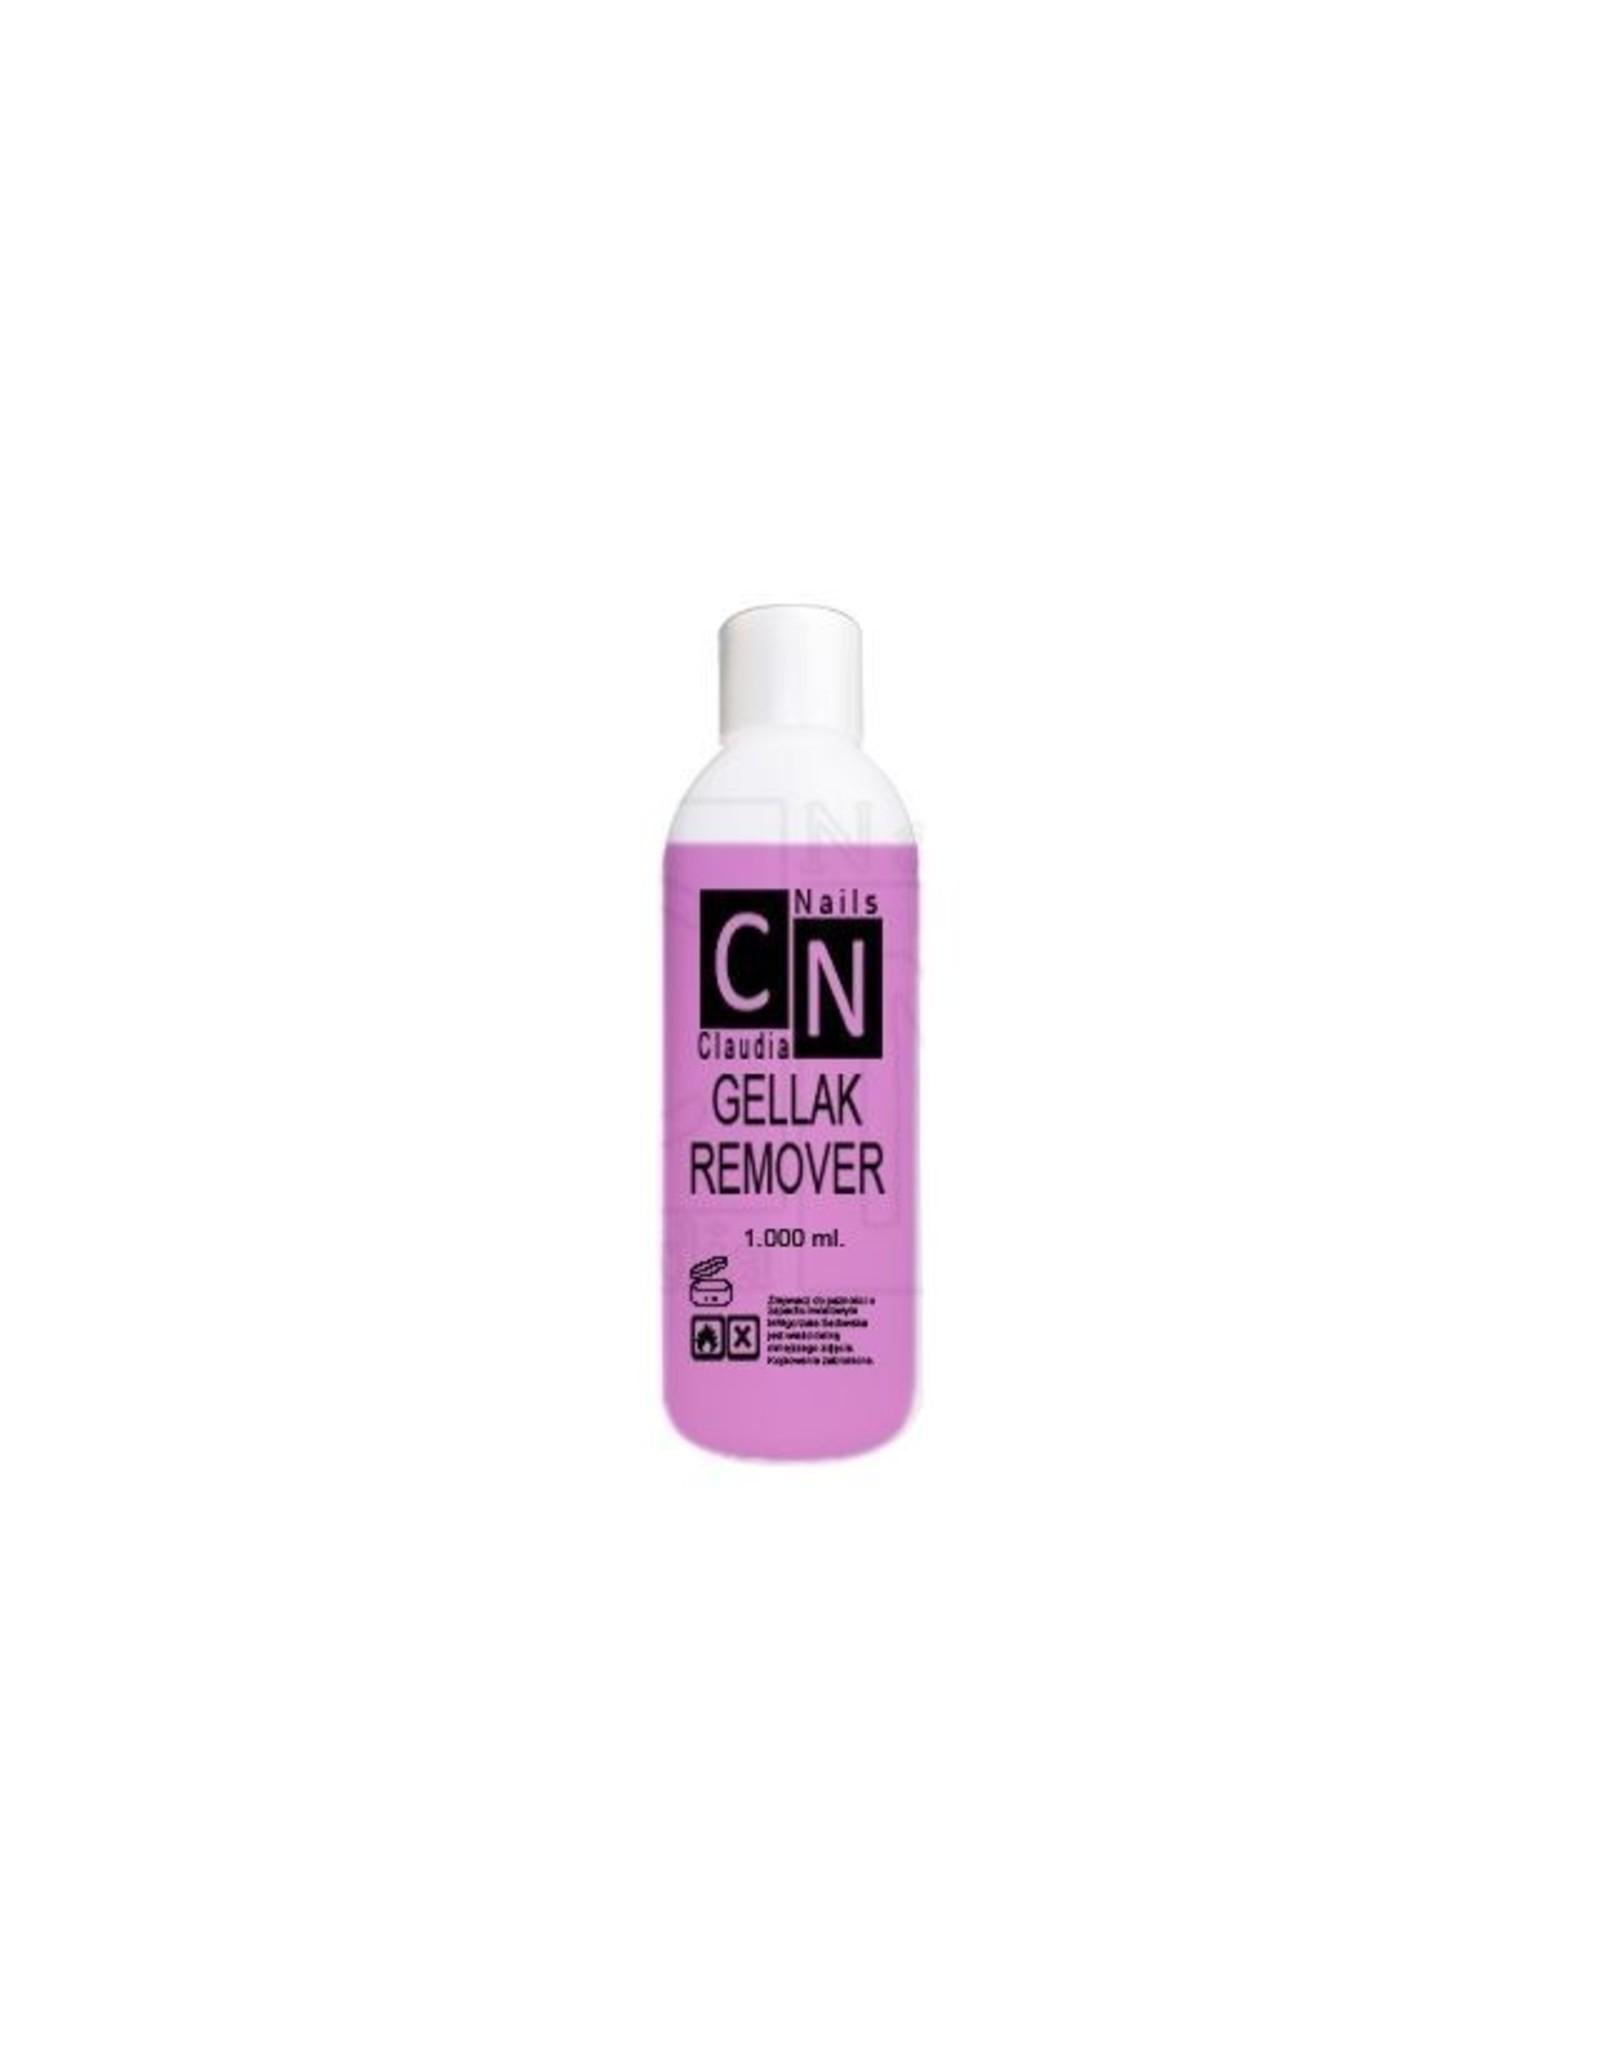 ClaudiaNails Gellak Remover 1000 ml